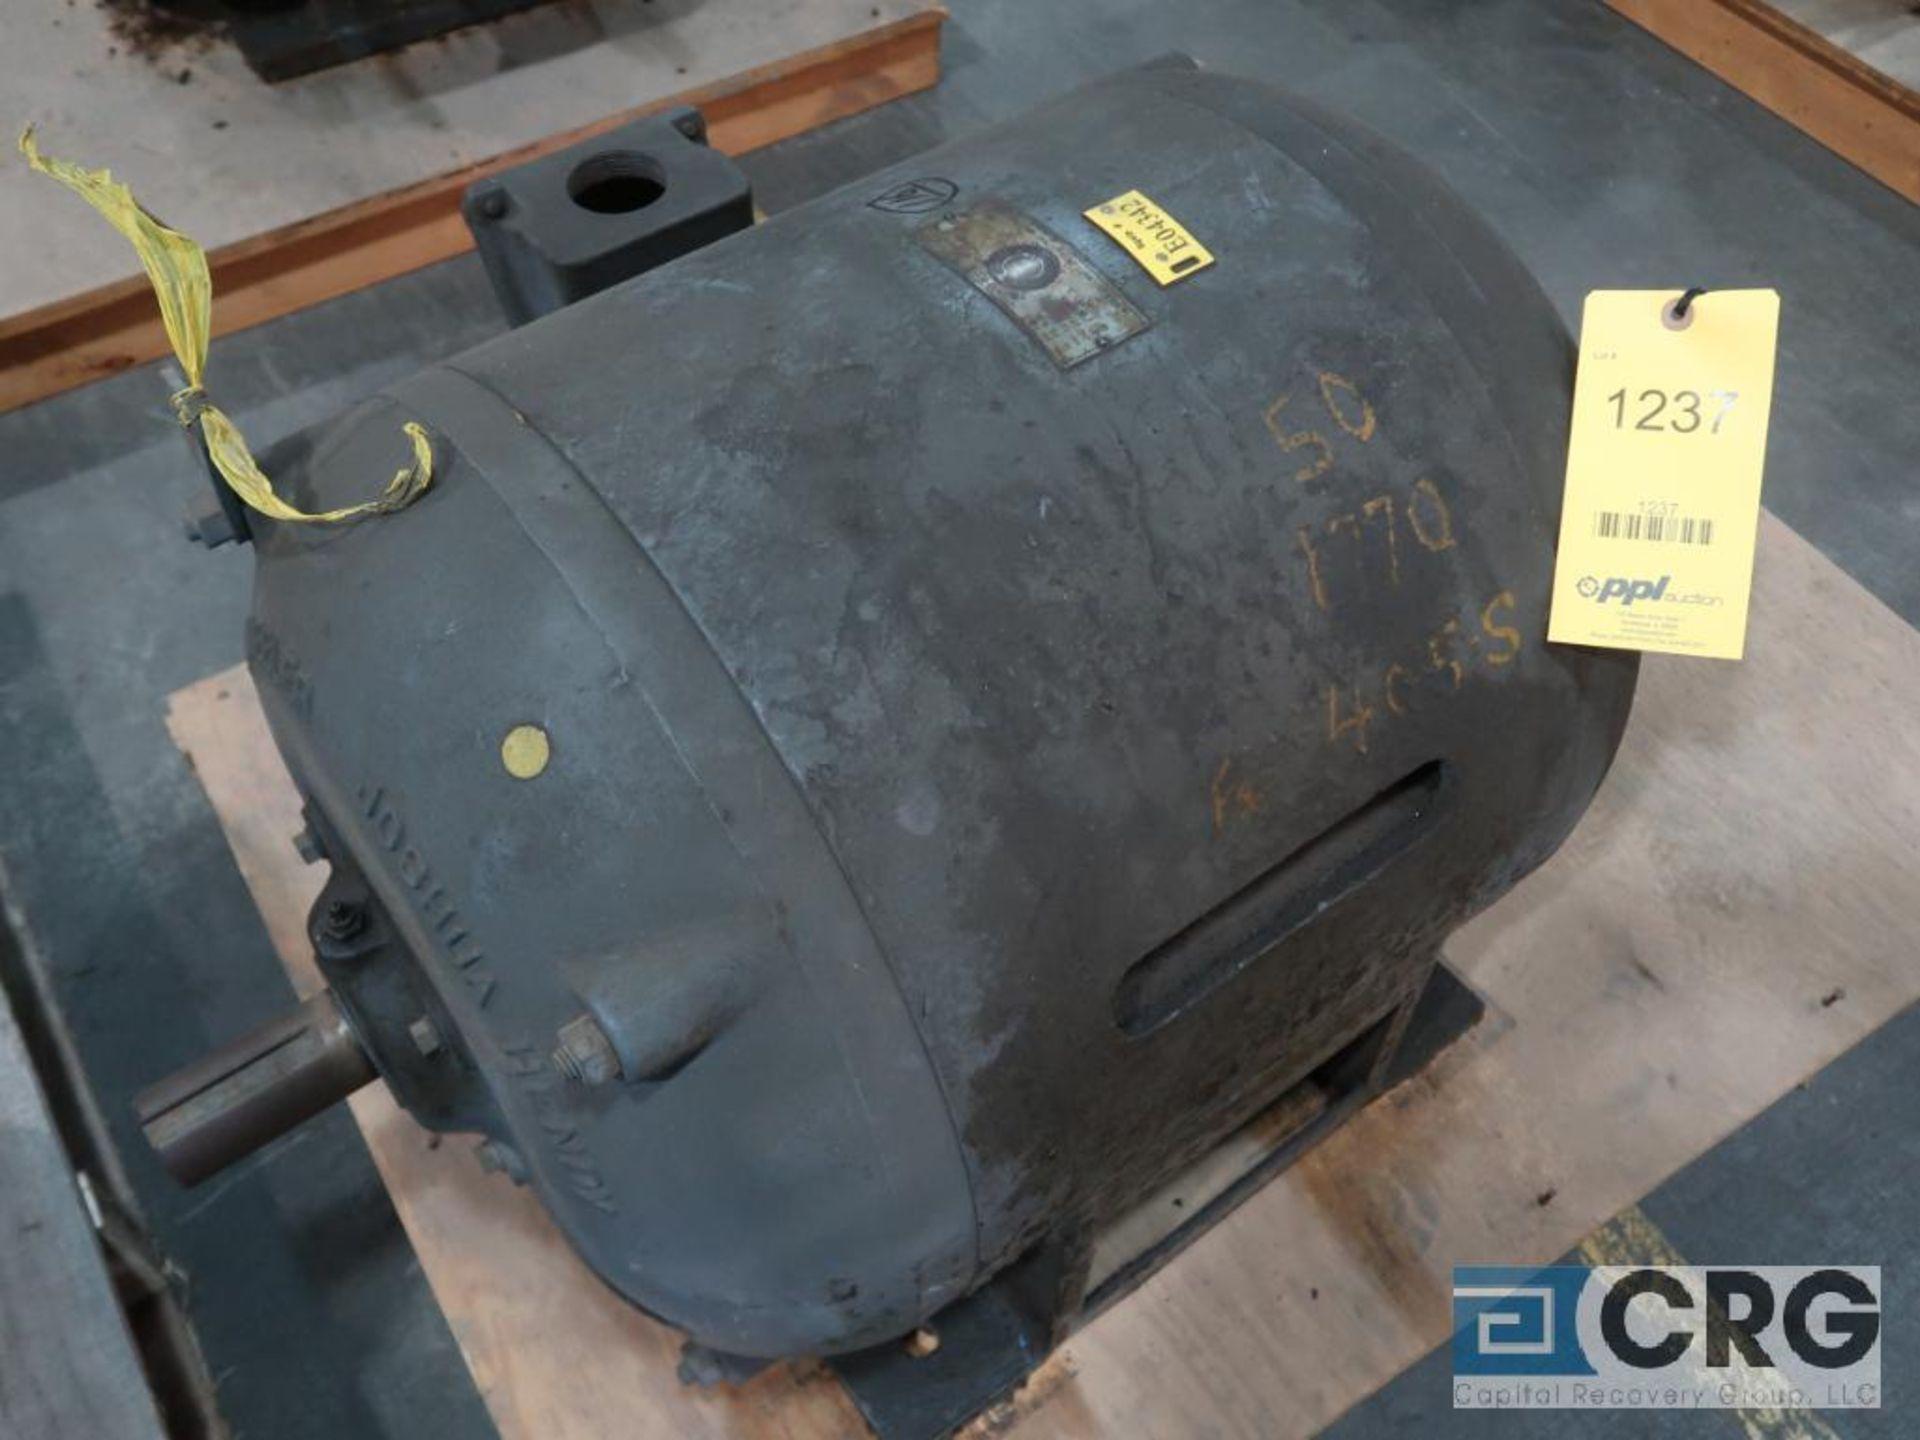 Crocker-Wheeler electric motor, 50 HP, 1,770 RPMs, 220/440 volt, 3 ph., BA405S frame (Finish